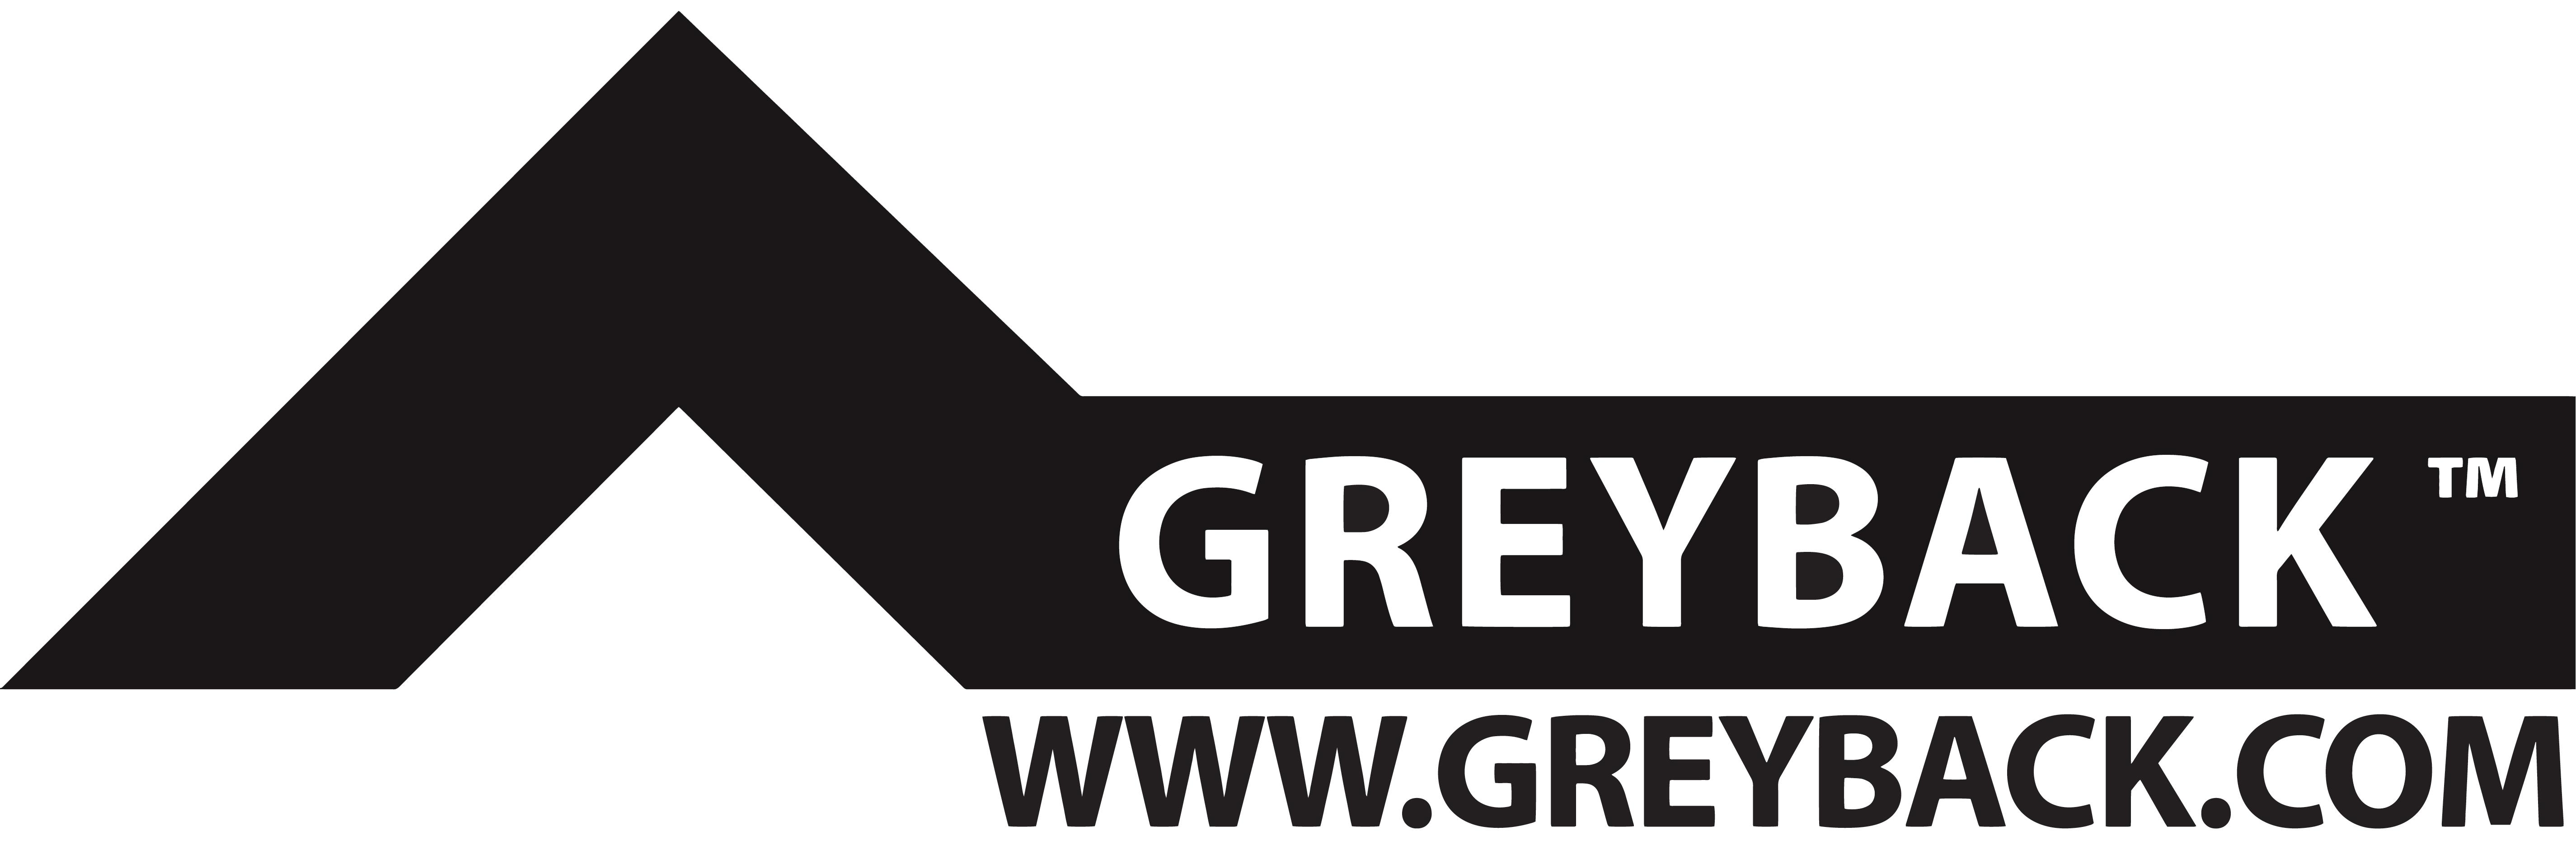 Greyback Construction Ltd.